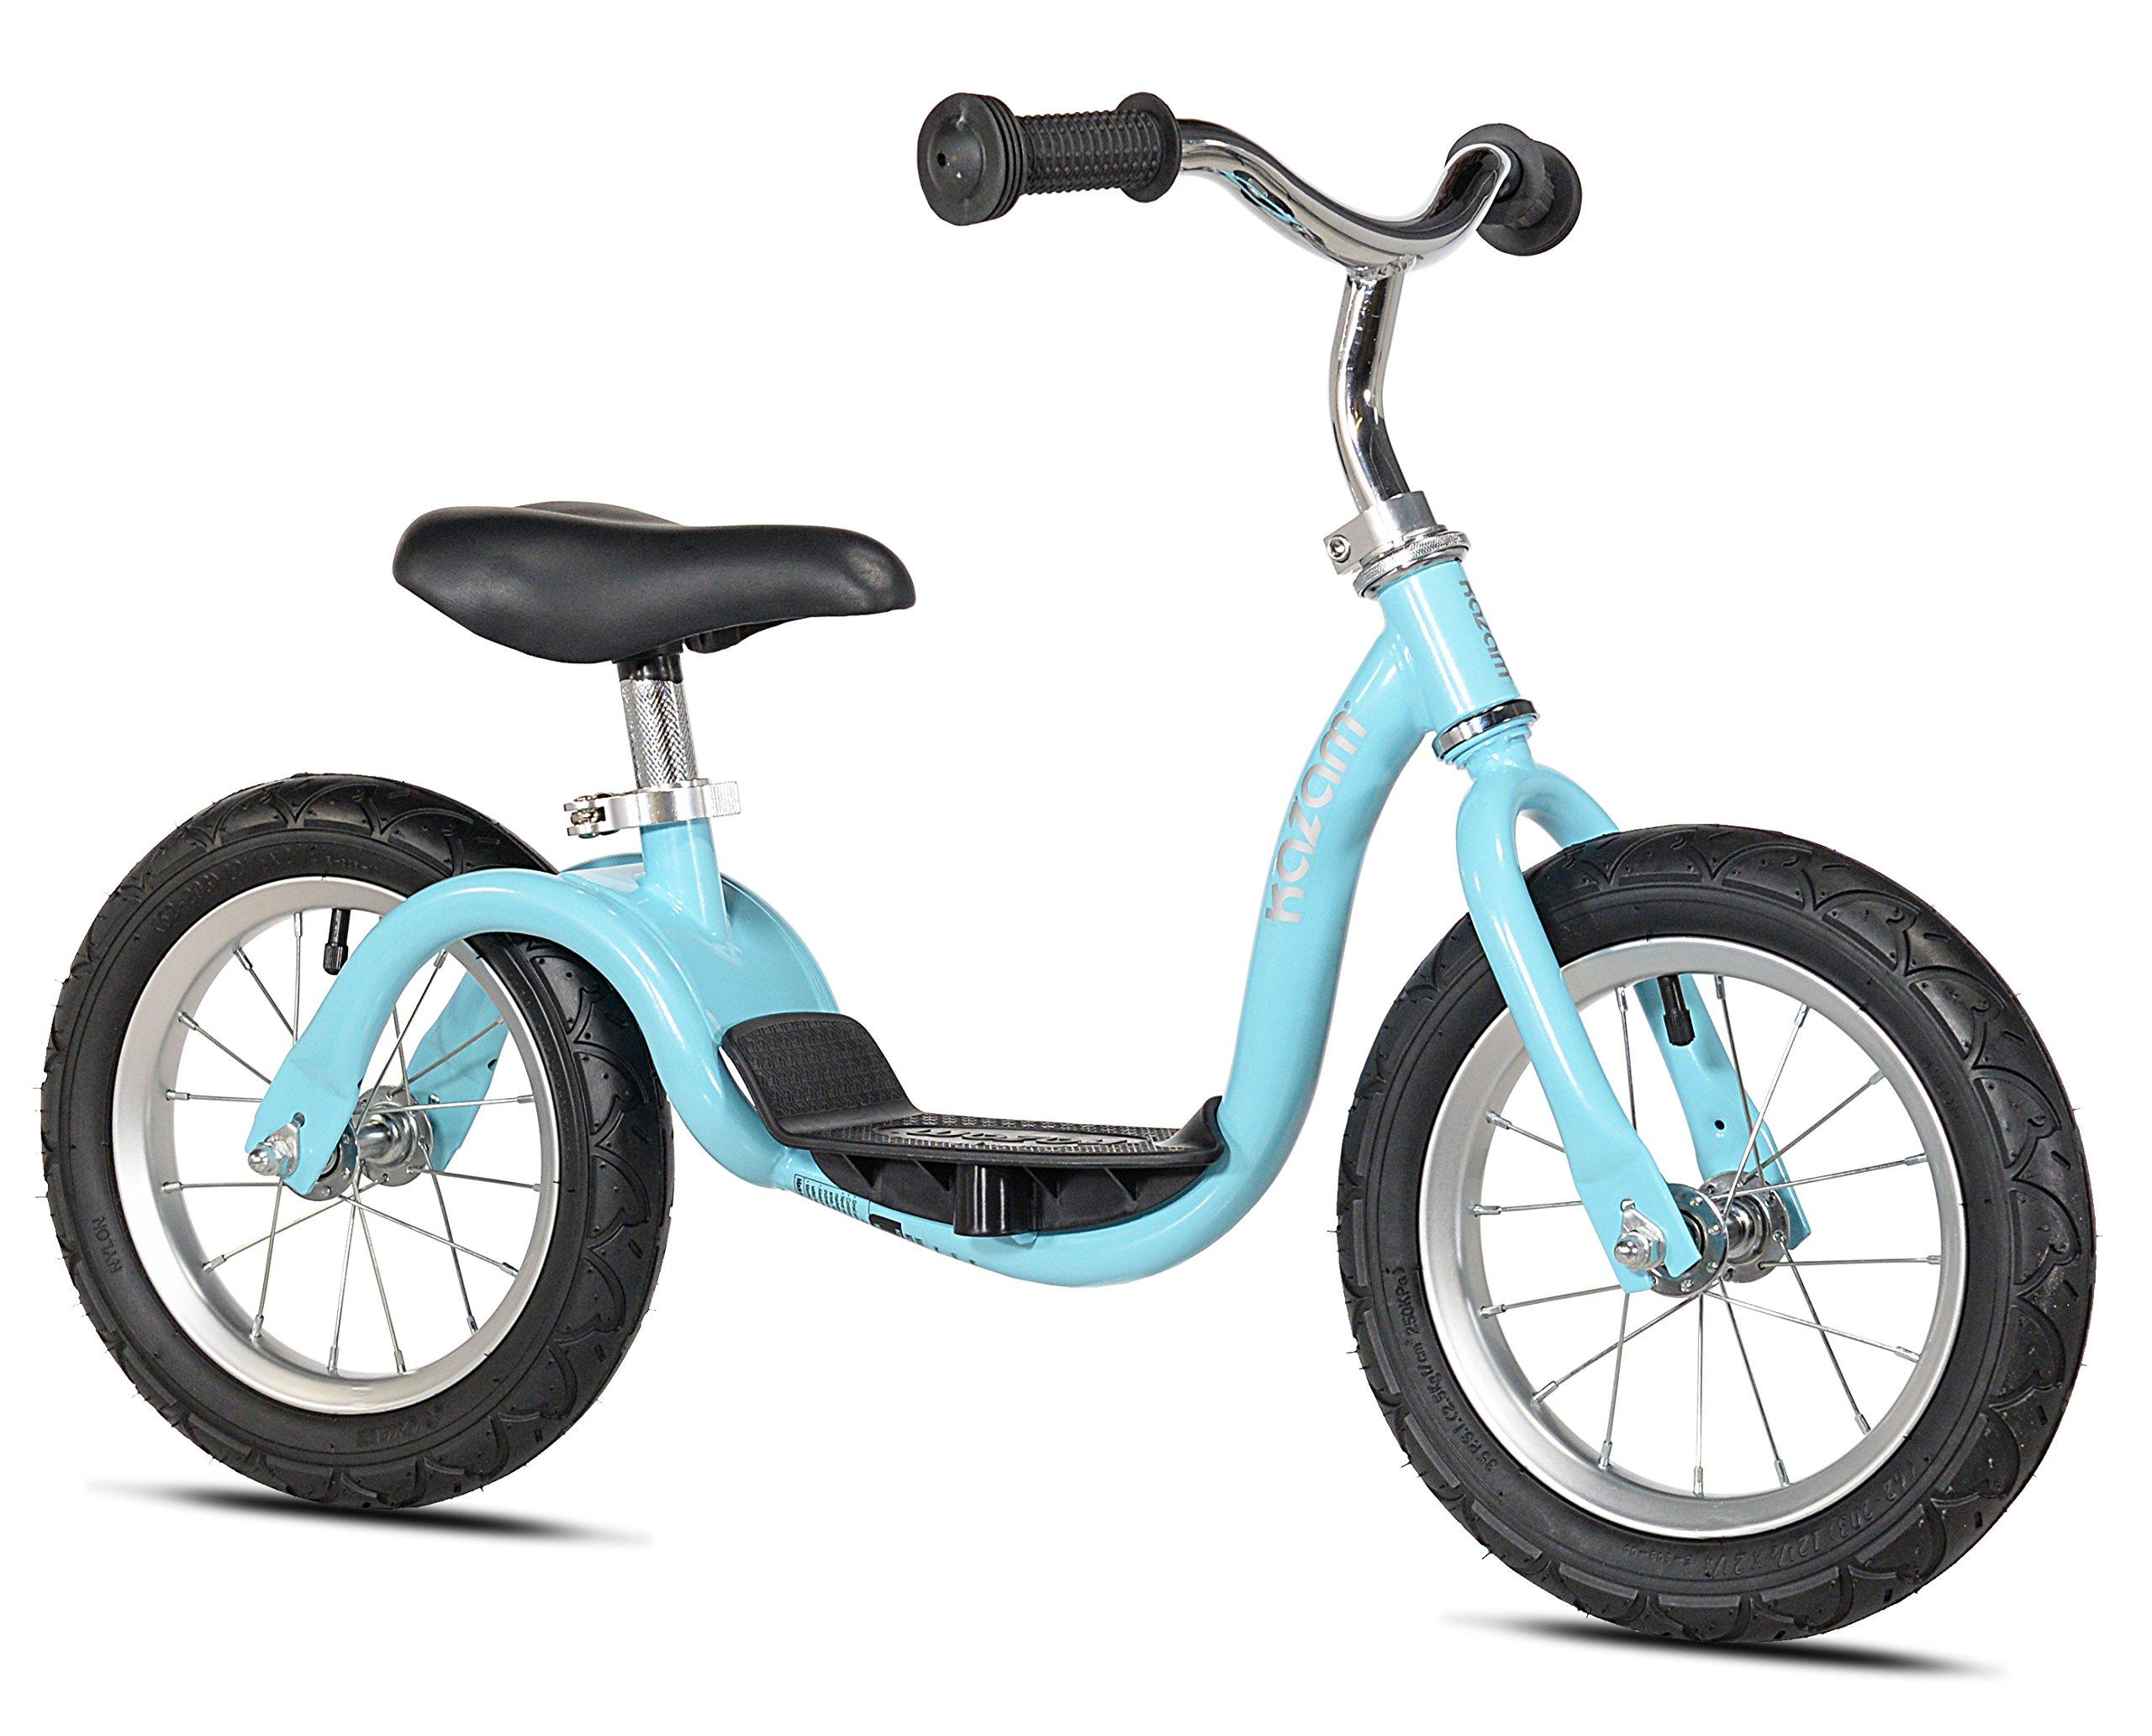 KaZAM v2s No Pedal Balance Bike, 12-Inch, Metallic Light Blue by KaZAM (Image #1)